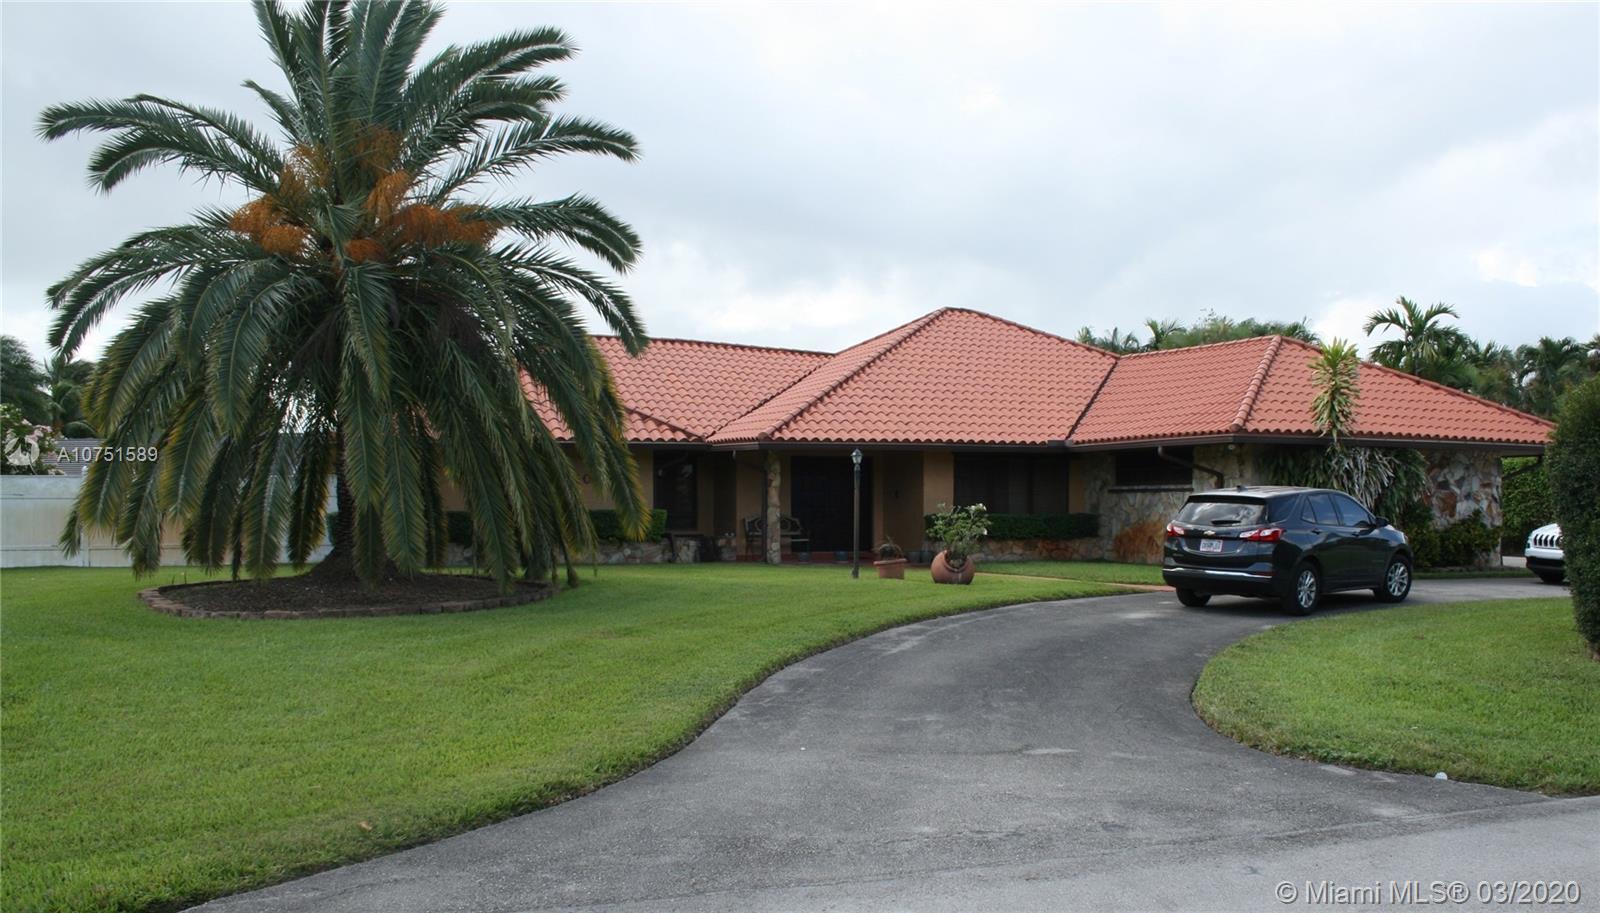 10450 NW 133 St, Hialeah Gardens, FL 33018